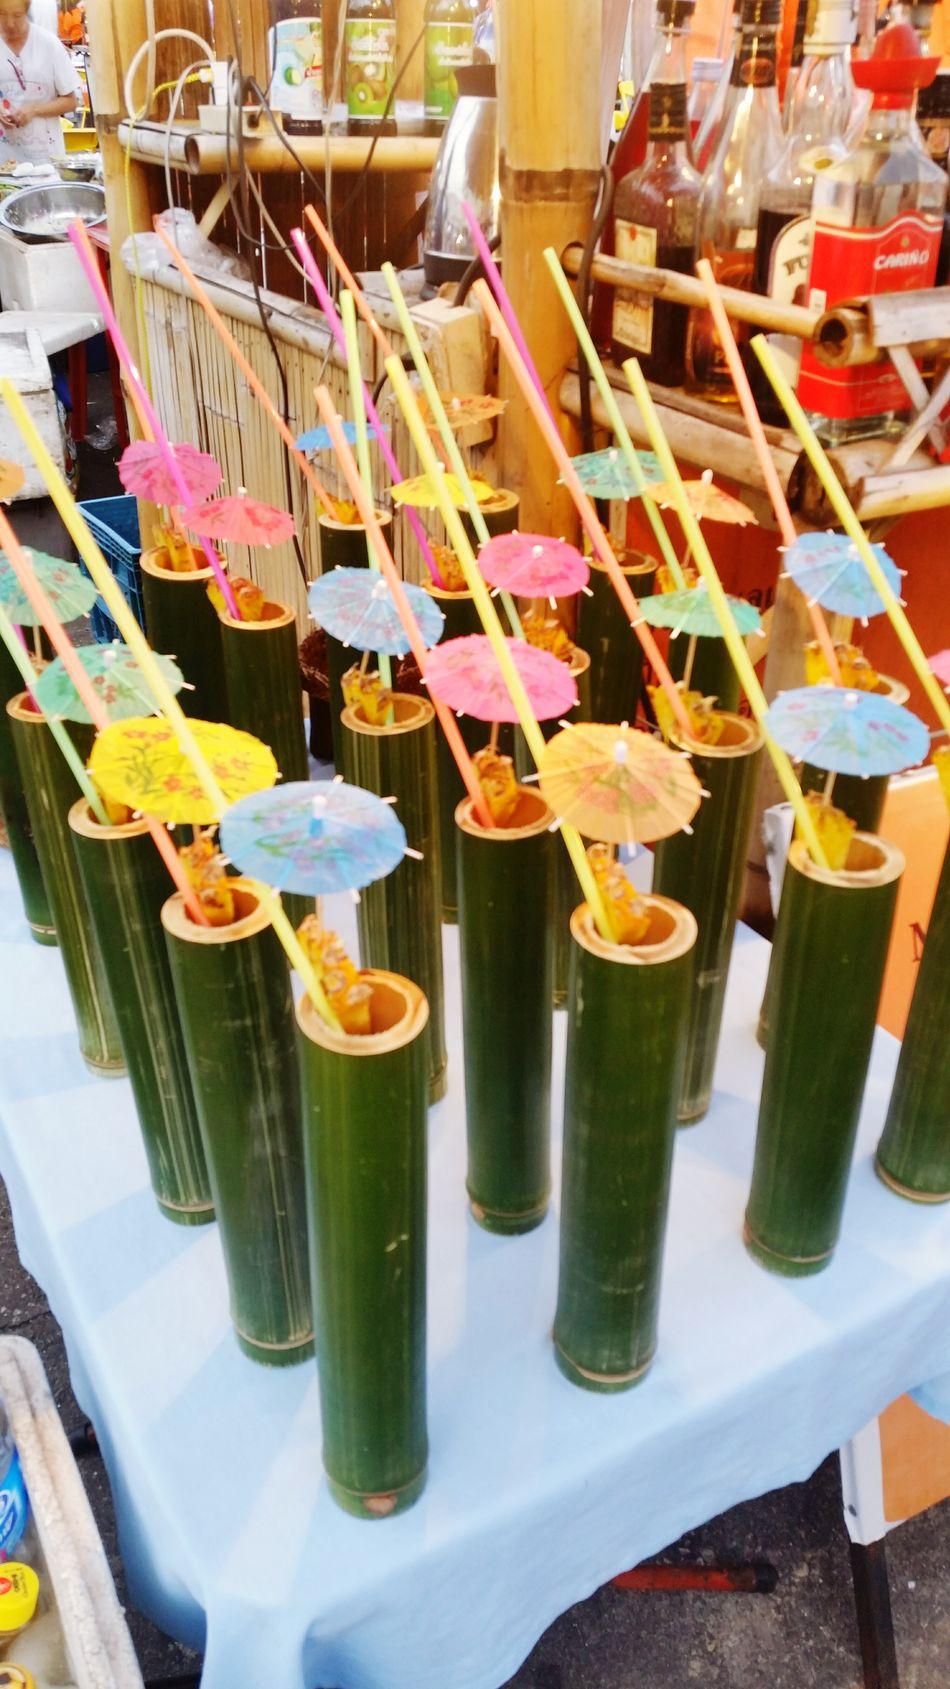 Cocktails Cocktails🍹🍸 Cocktailinbamboo Cocktail In Bamboo Beautifully Organized